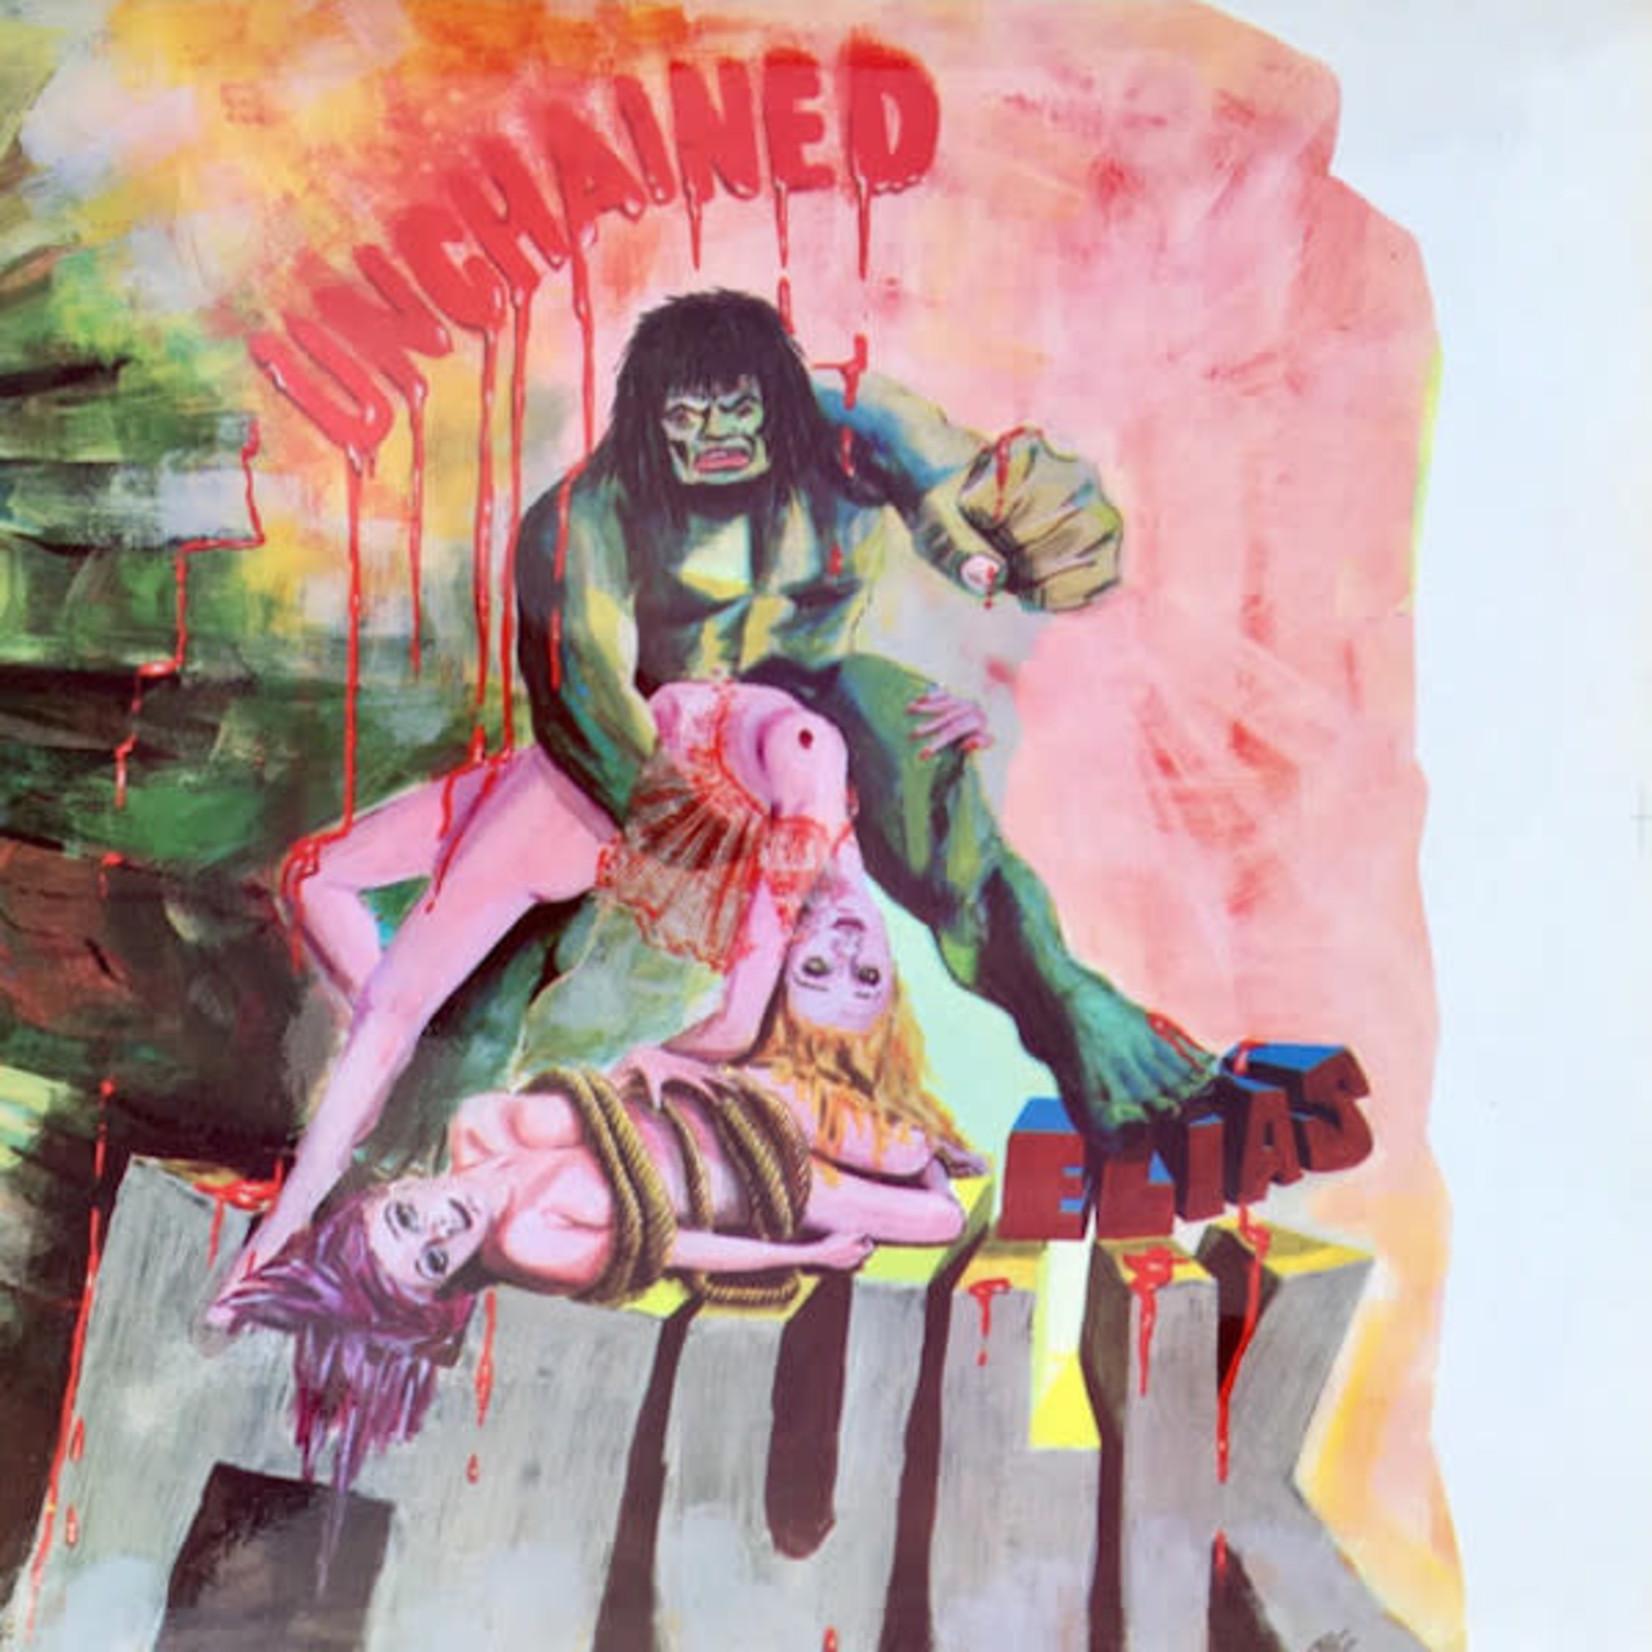 Vinyl Elias Hulk - Unchained